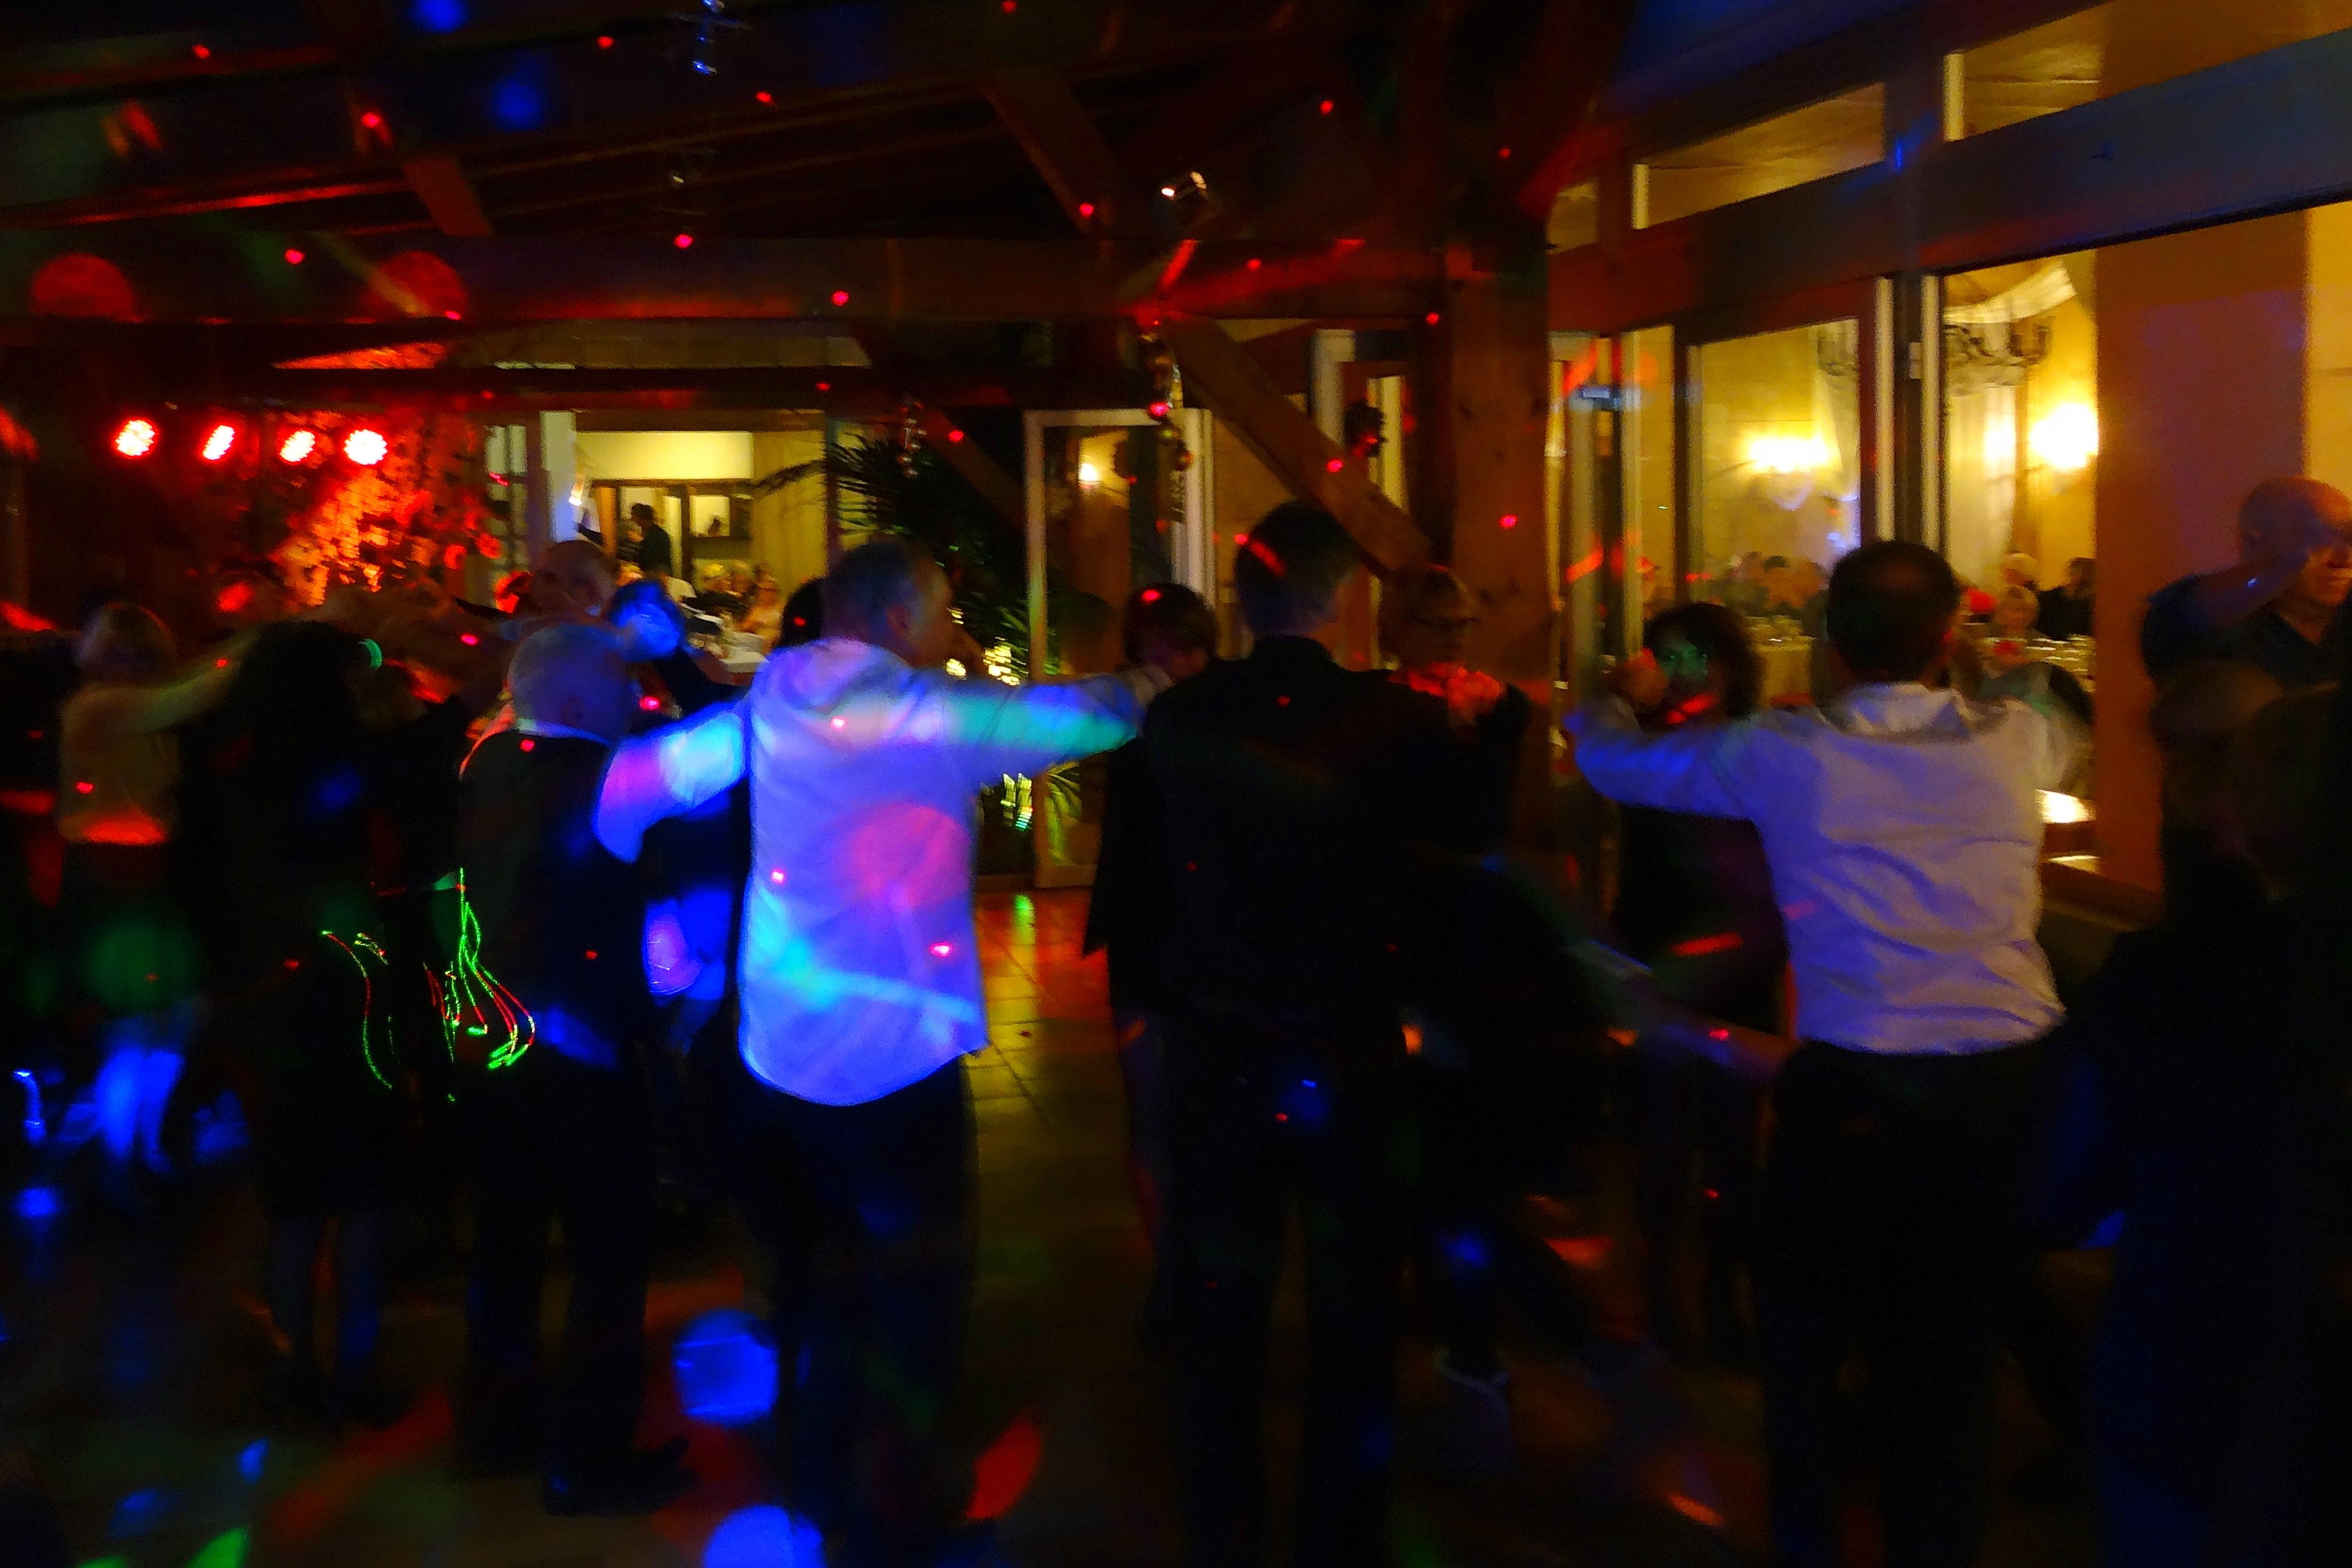 Soirée à thème disco Avignon